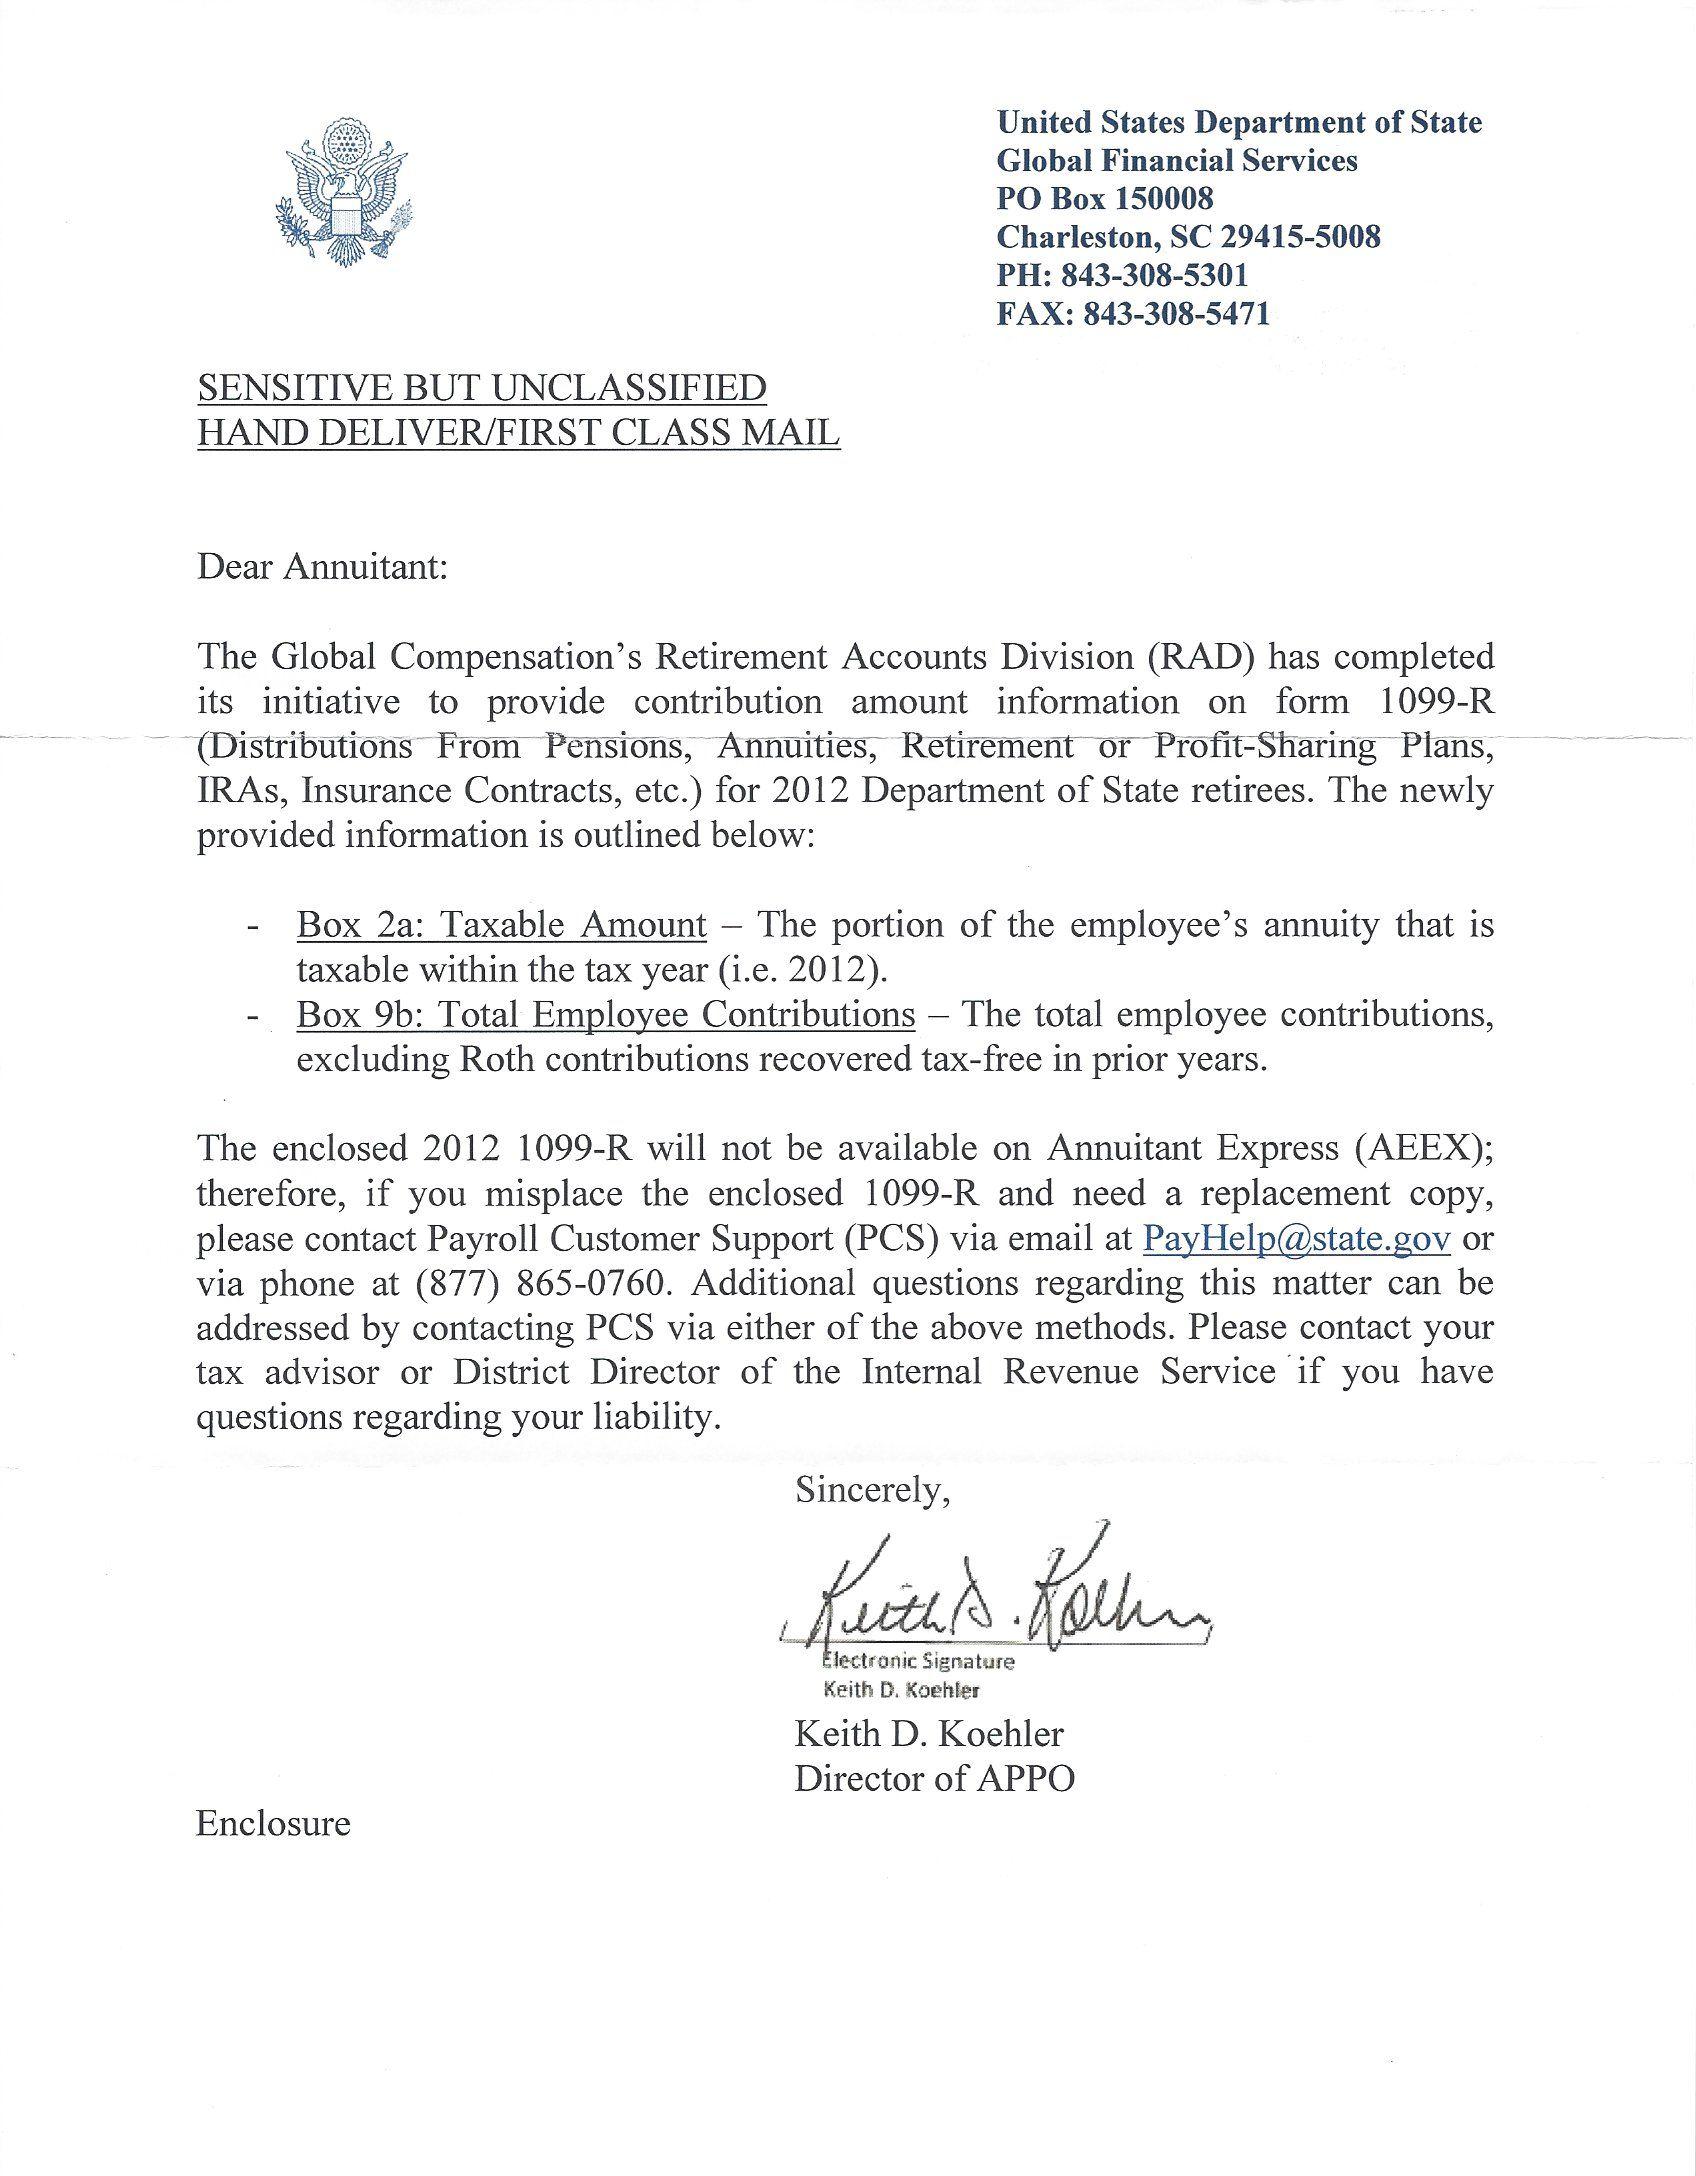 Homeland Security Cover Letter Sample  Andrian James Blog